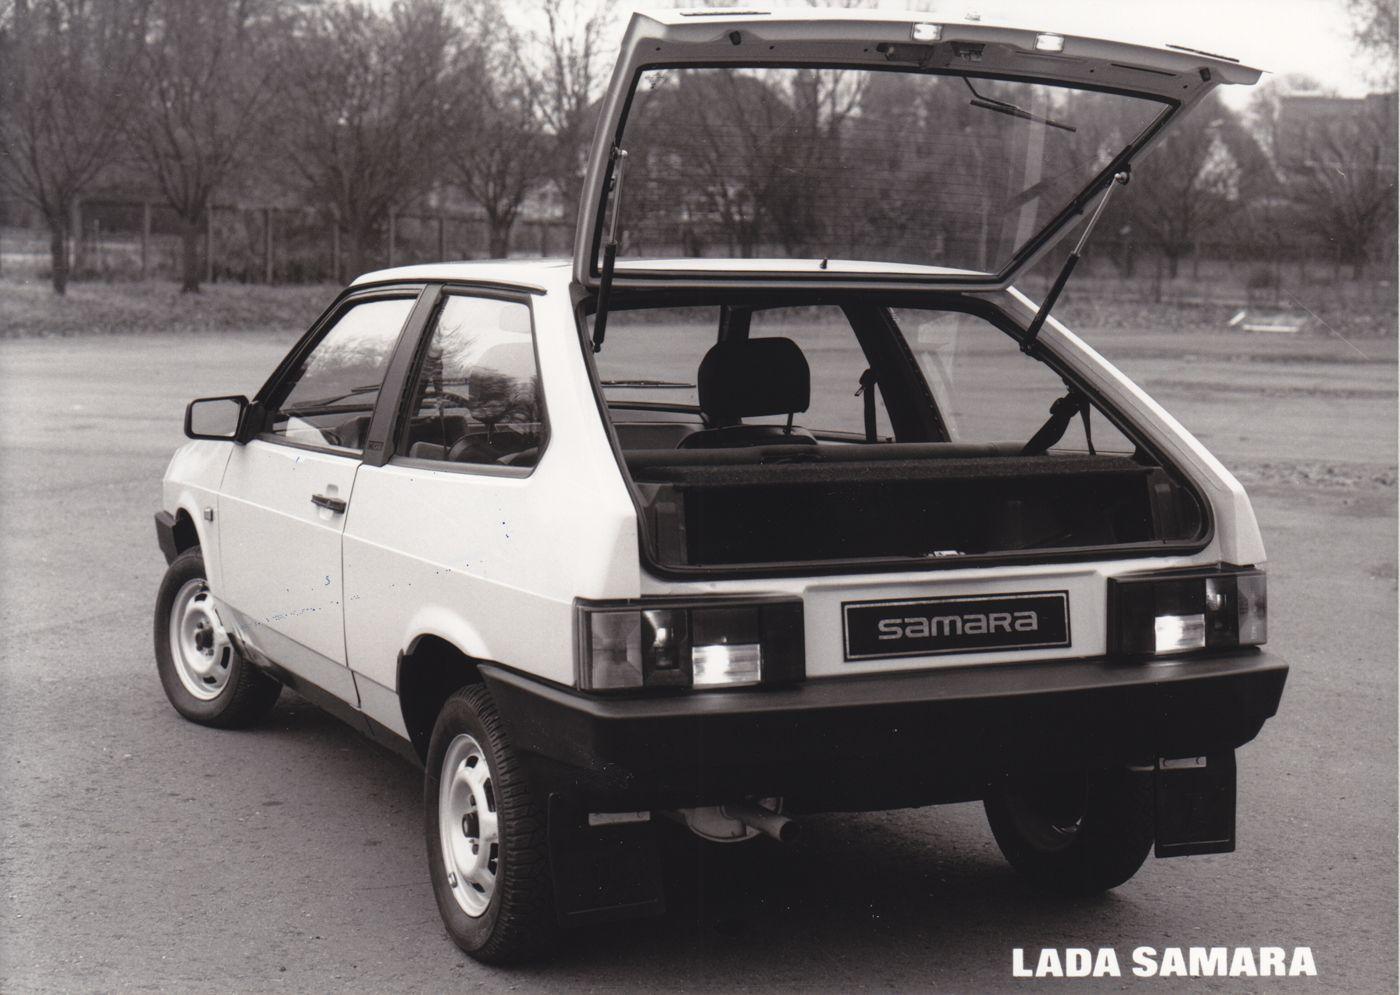 Lada samara flyte concept car (uk)